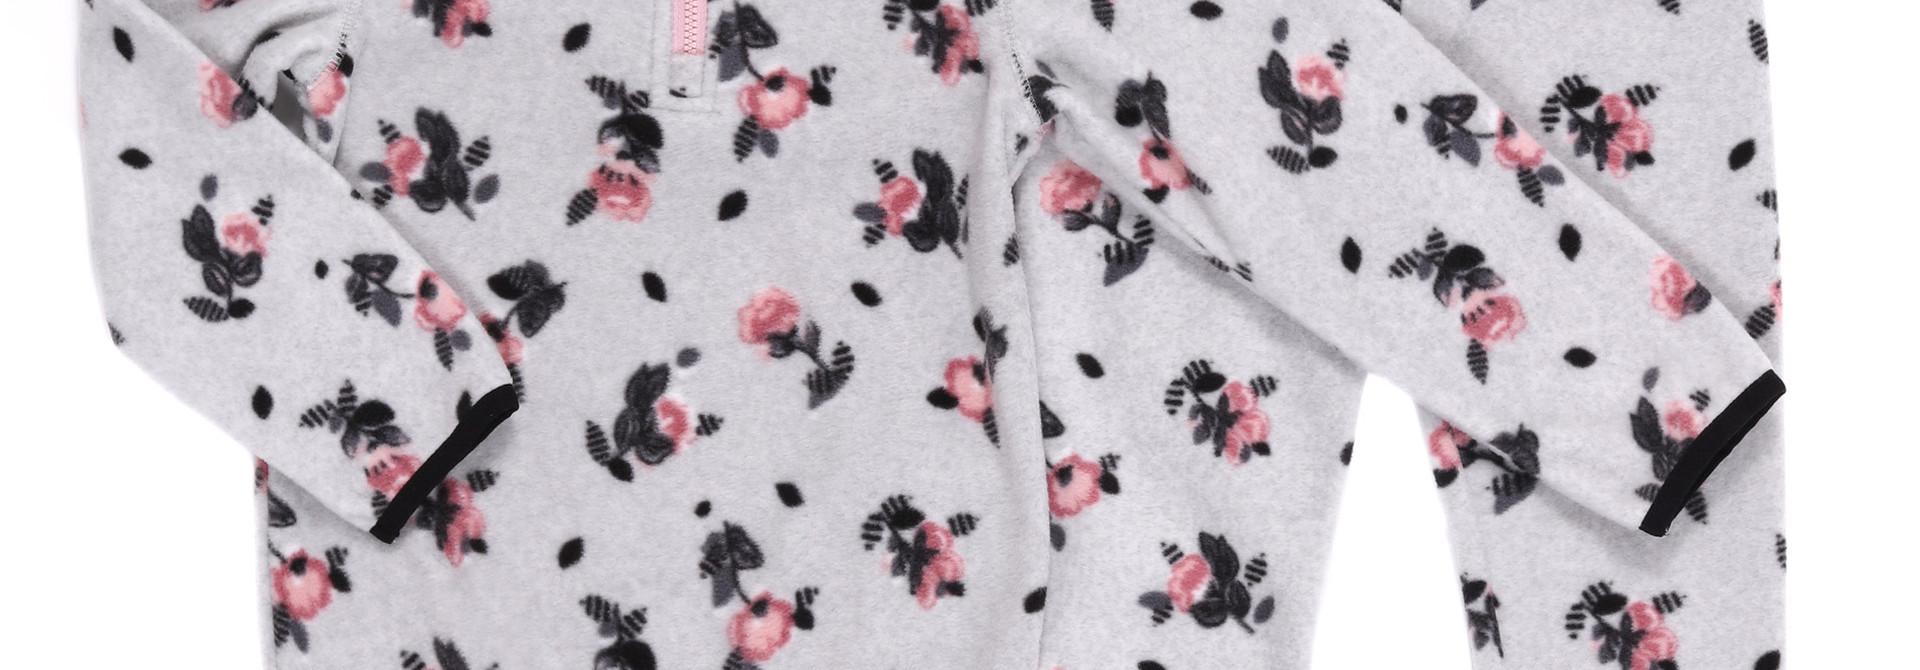 Sous-vêtement en micropolar Fleurs